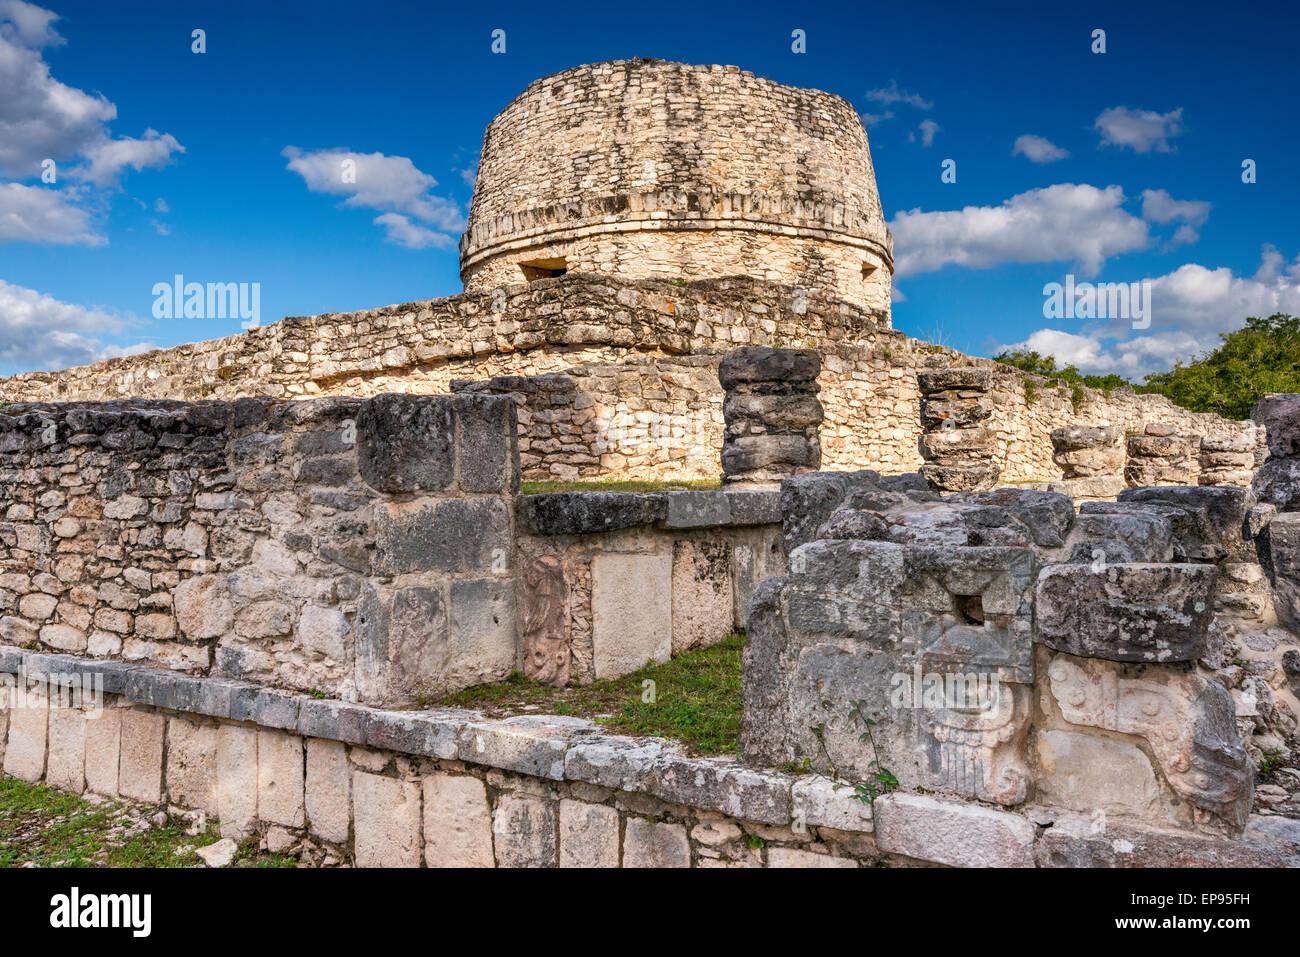 El Templo Redondo (Rounded Temple), Maya ruins at Mayapan archaelogical site, Yucatan state, Mexico - Stock Image